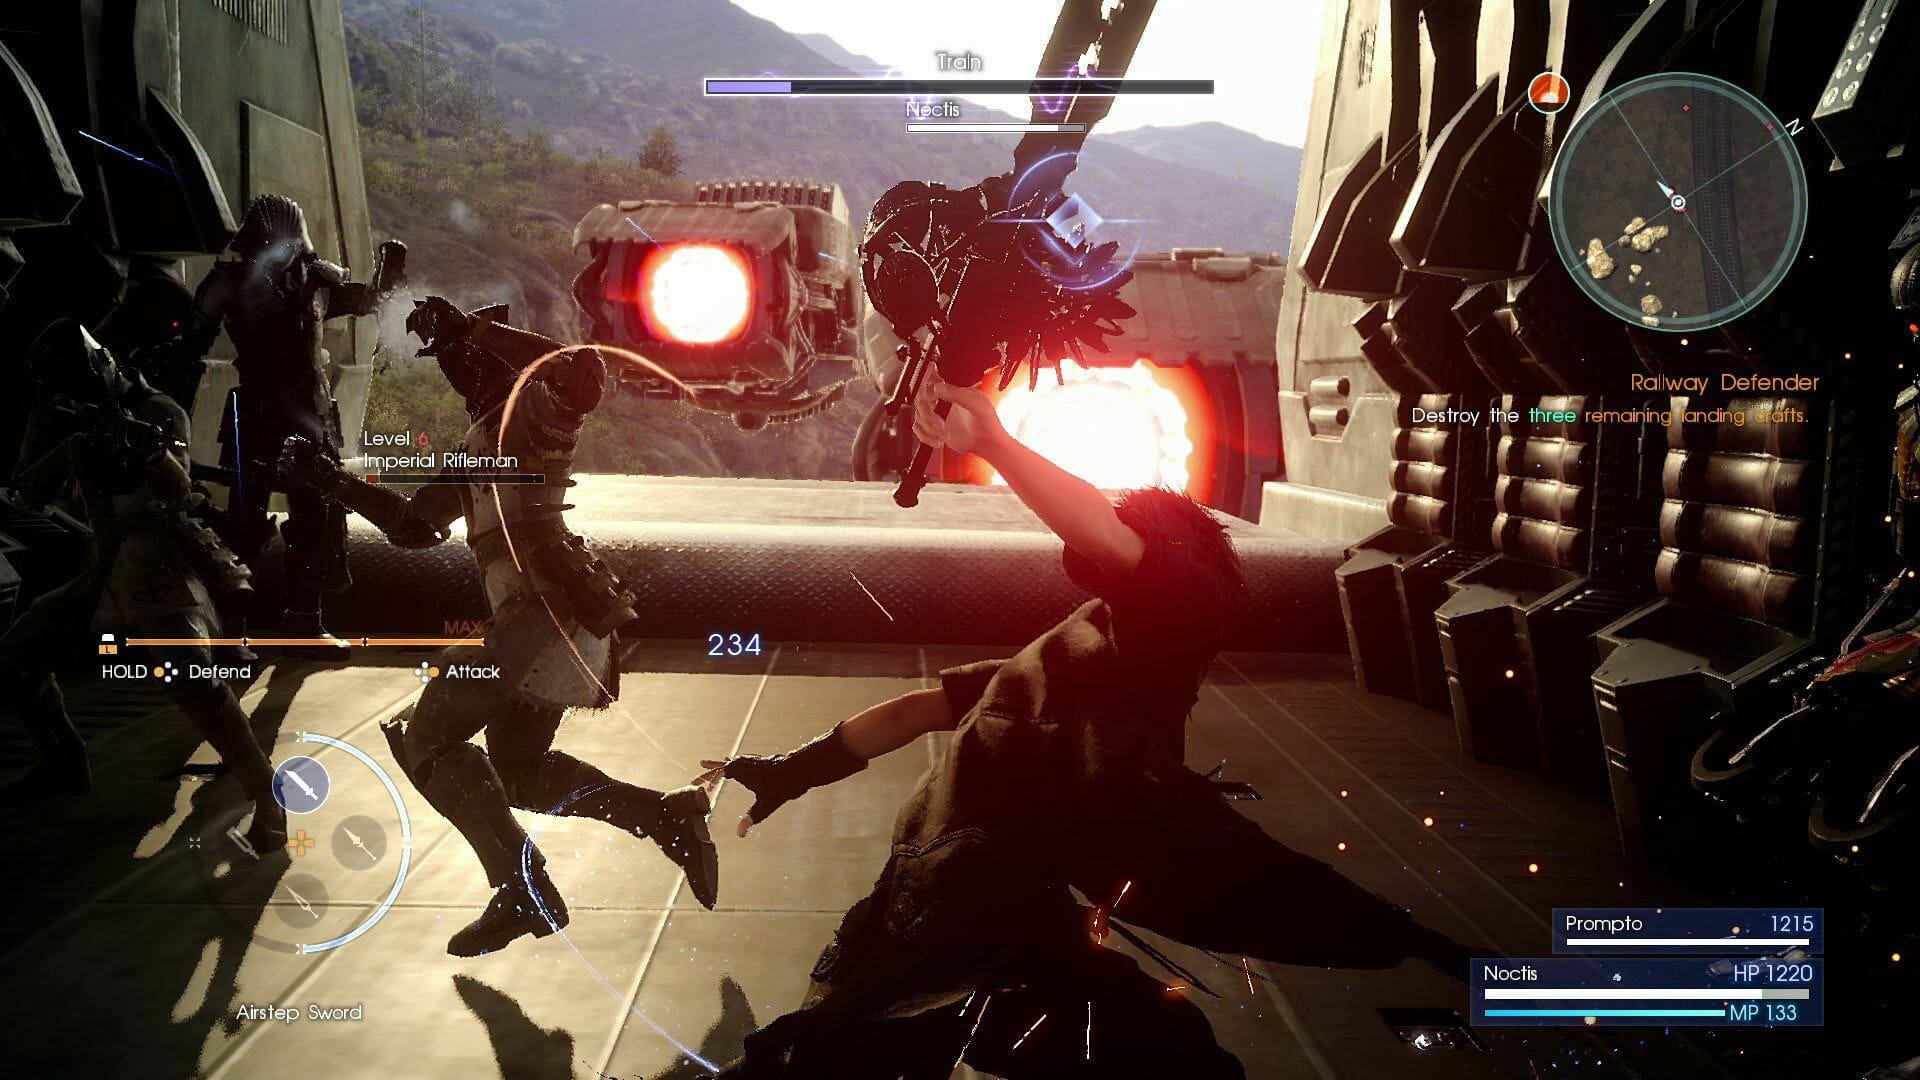 FF15_SQUARE-ENIX_Noctis-Battle-on-Landing-Craft_Screenshot_06132016